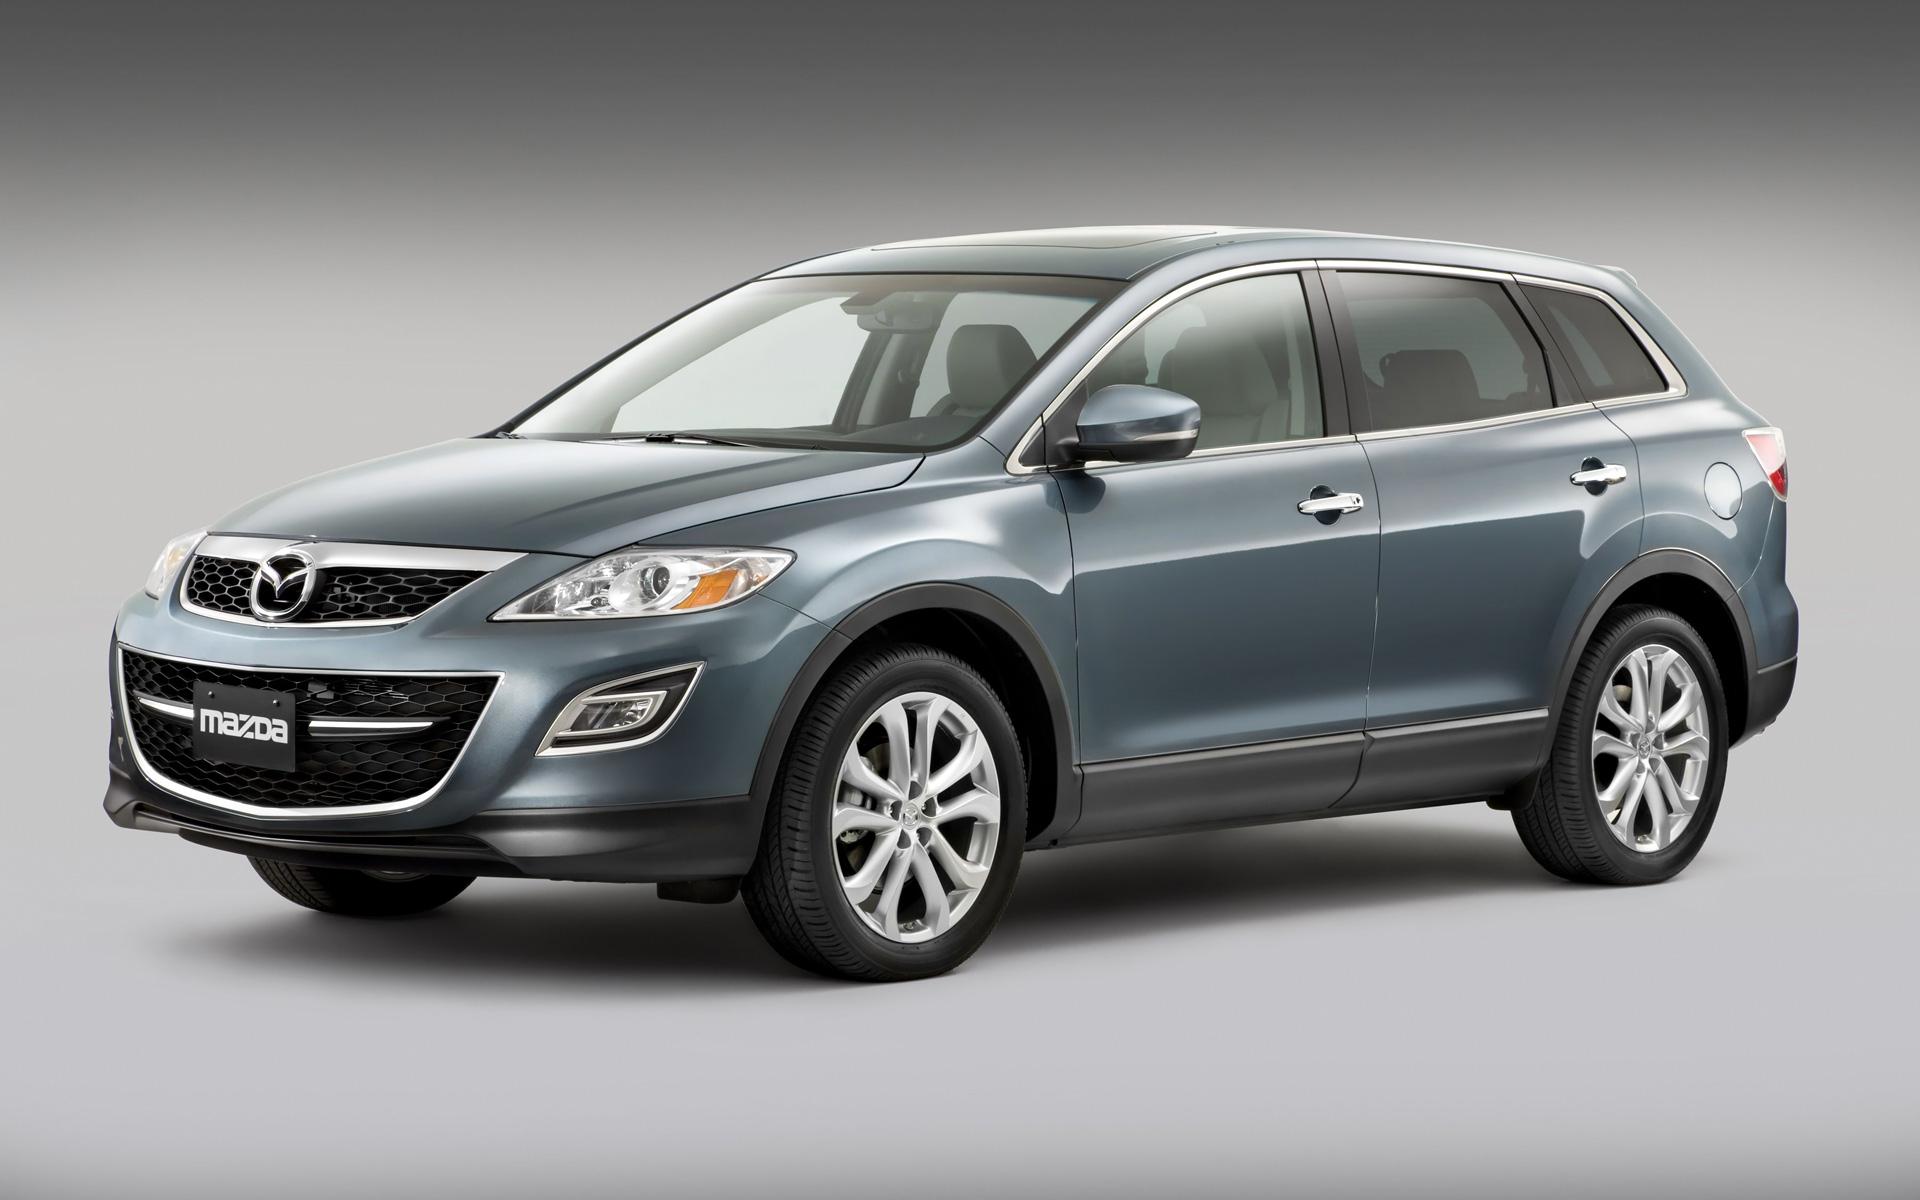 Mazda Crossover Vehicles 40 Car Desktop Wallpaper